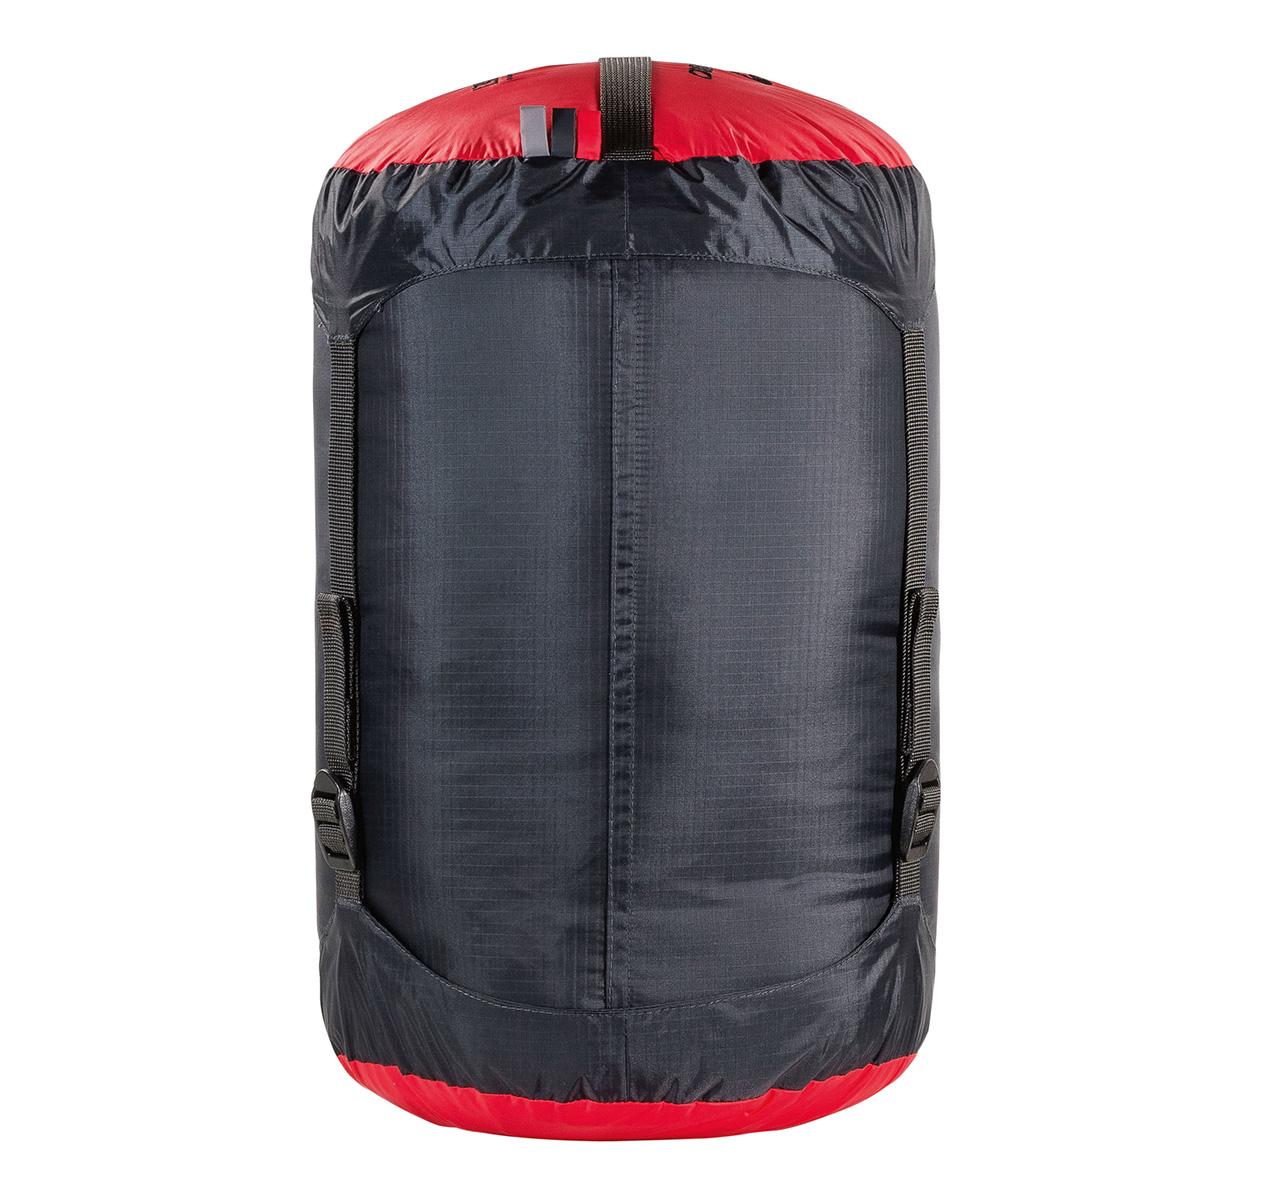 Lightec 1200 Duvet Sleeping Bag